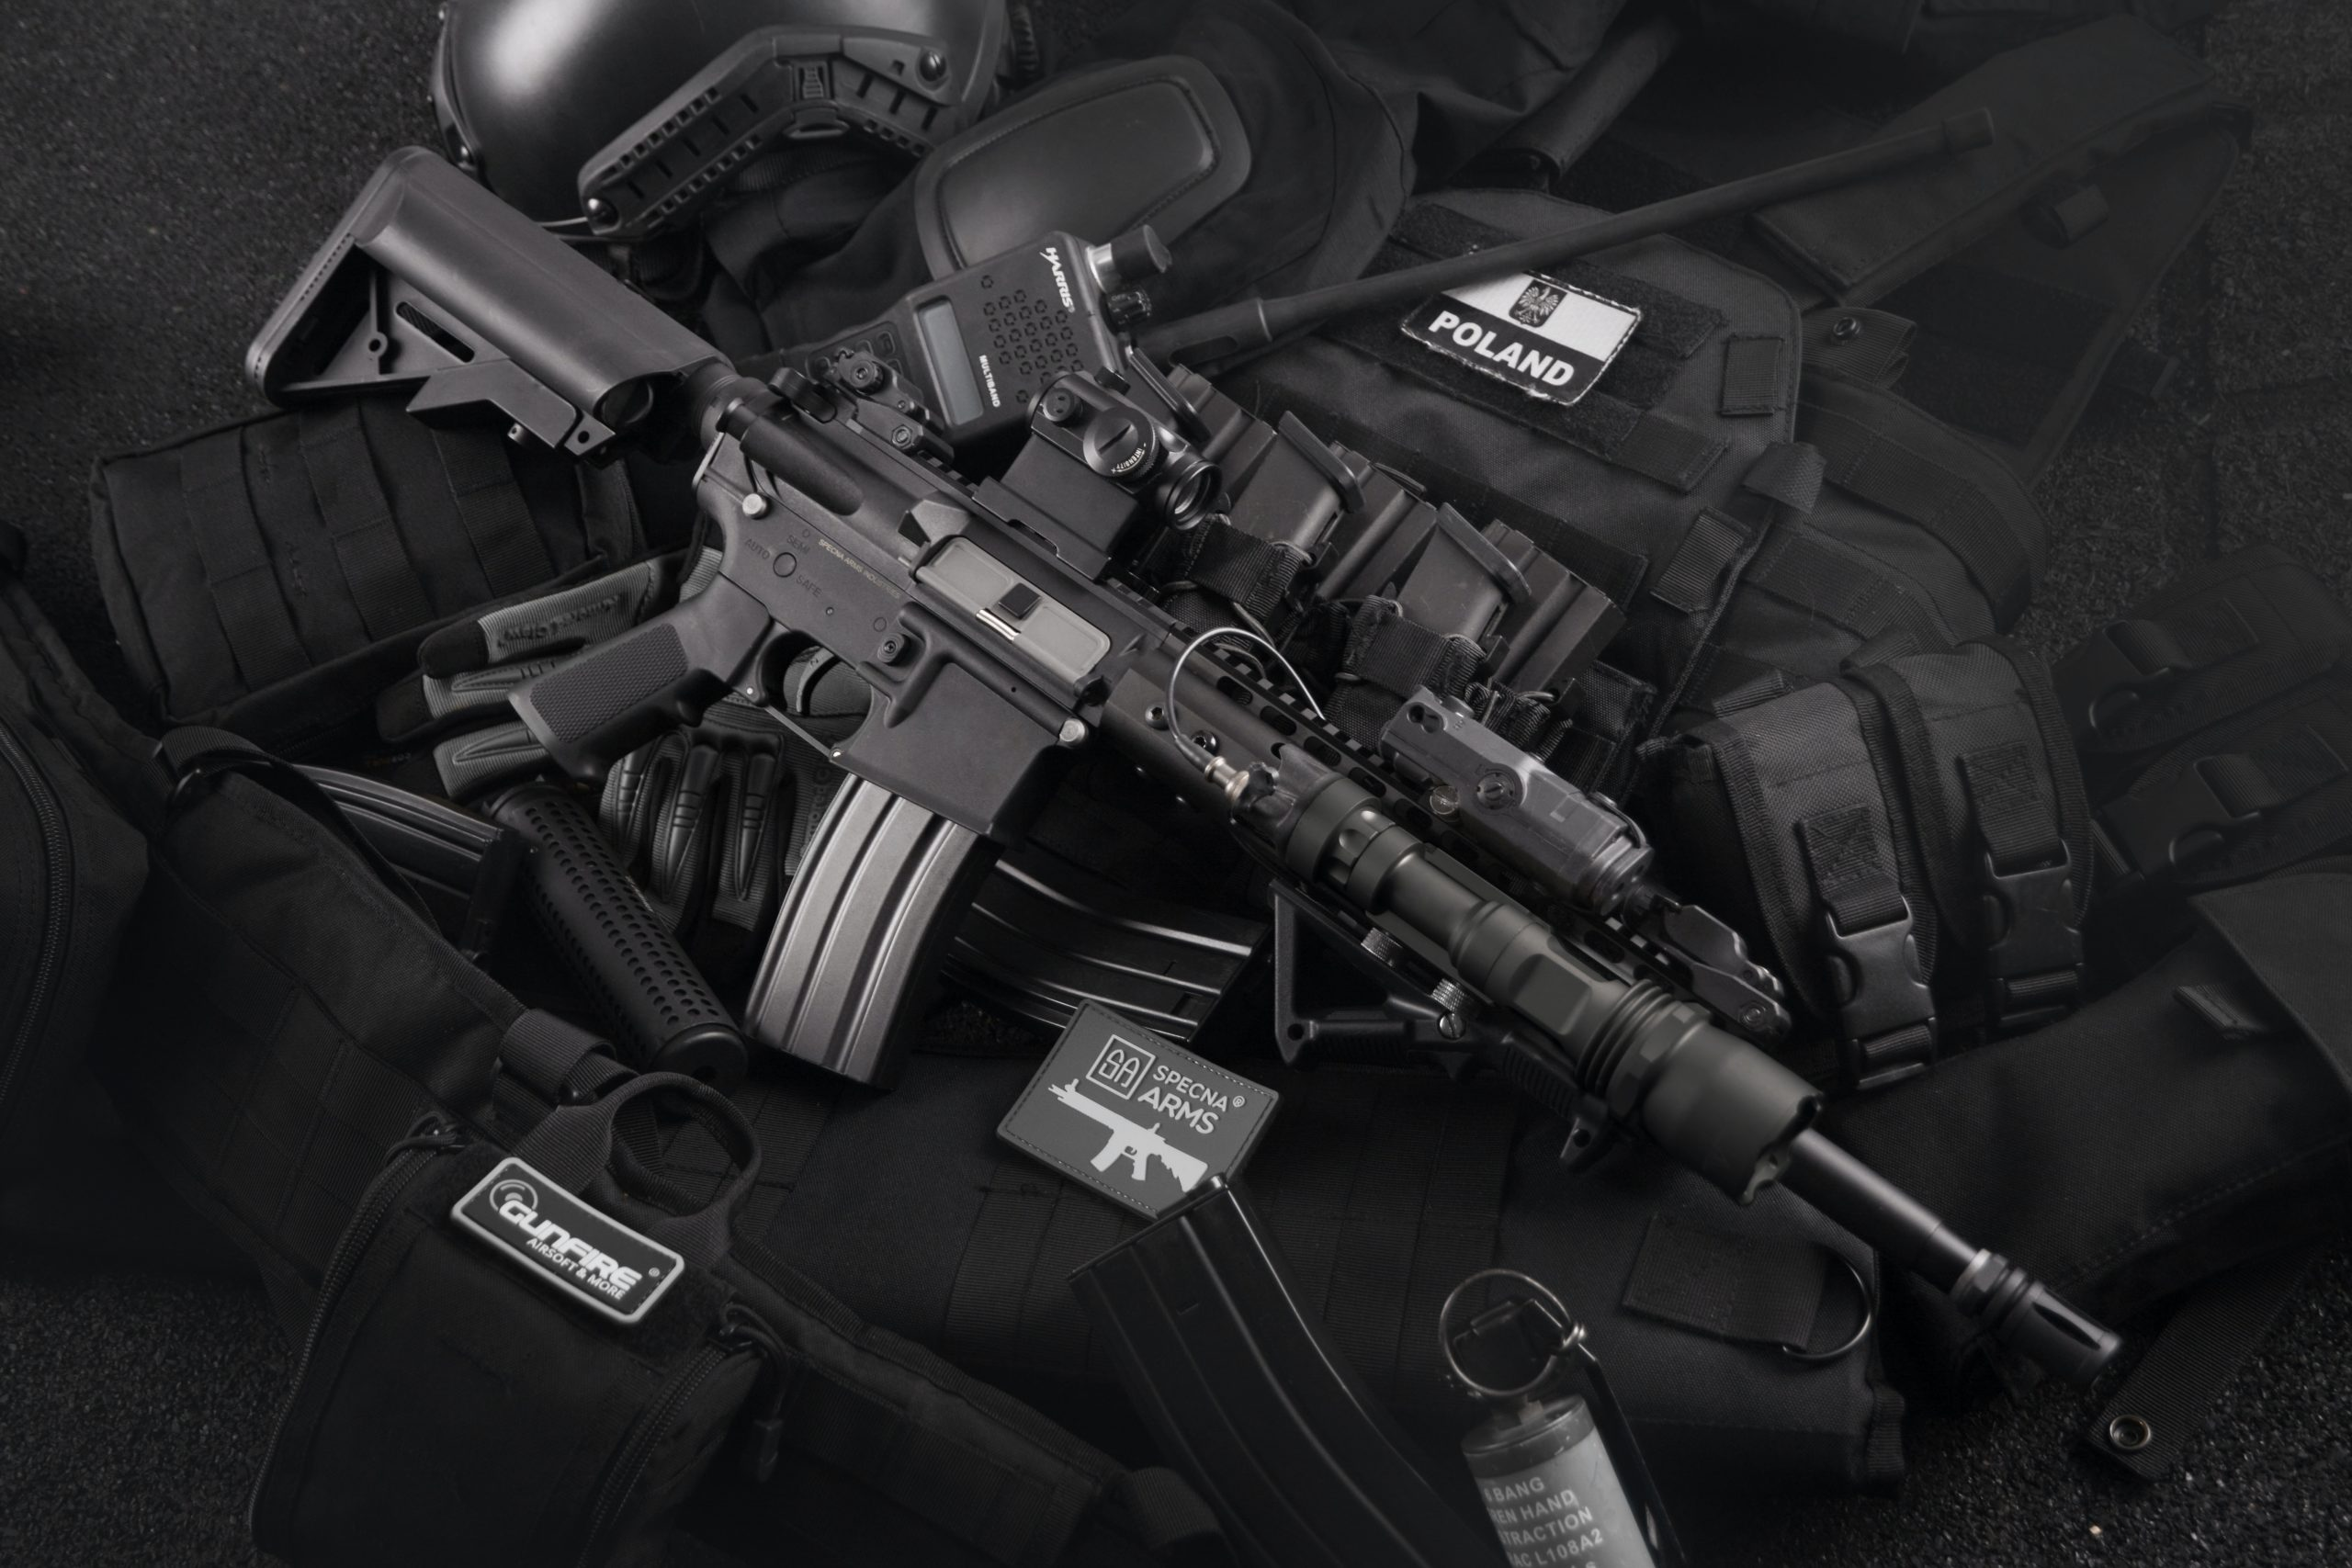 2020's Best AR-15 Pistol Reviews